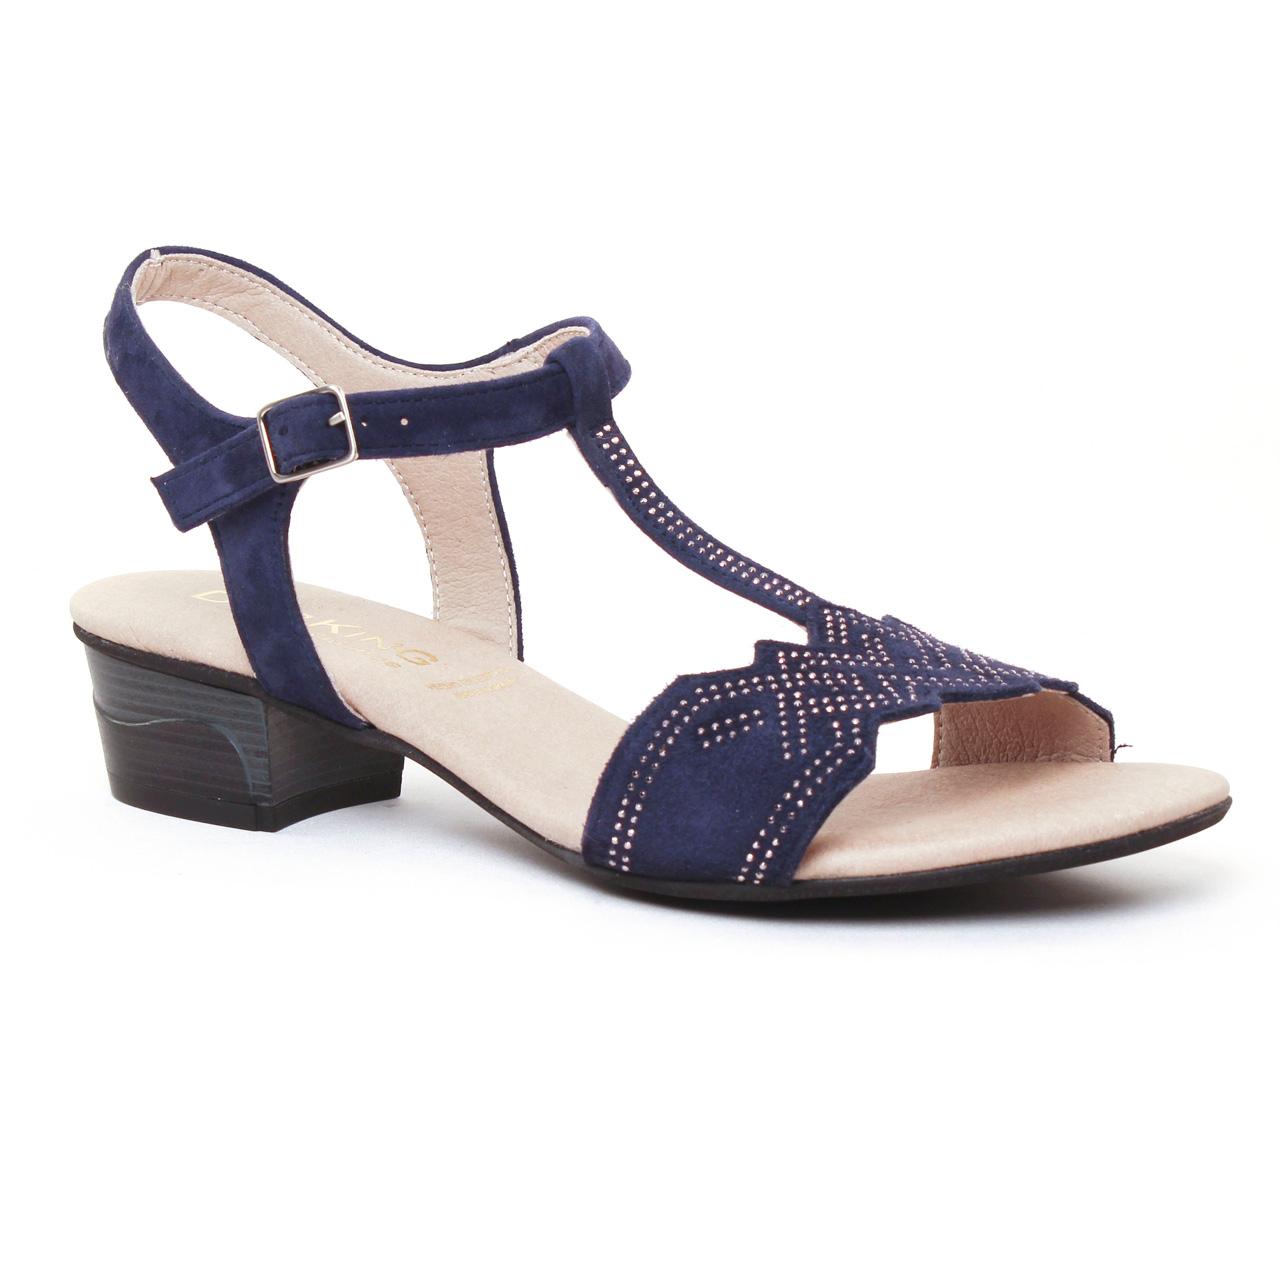 Bleu Femme Marine thiltrading Chaussures Sandales QdCBtshrx